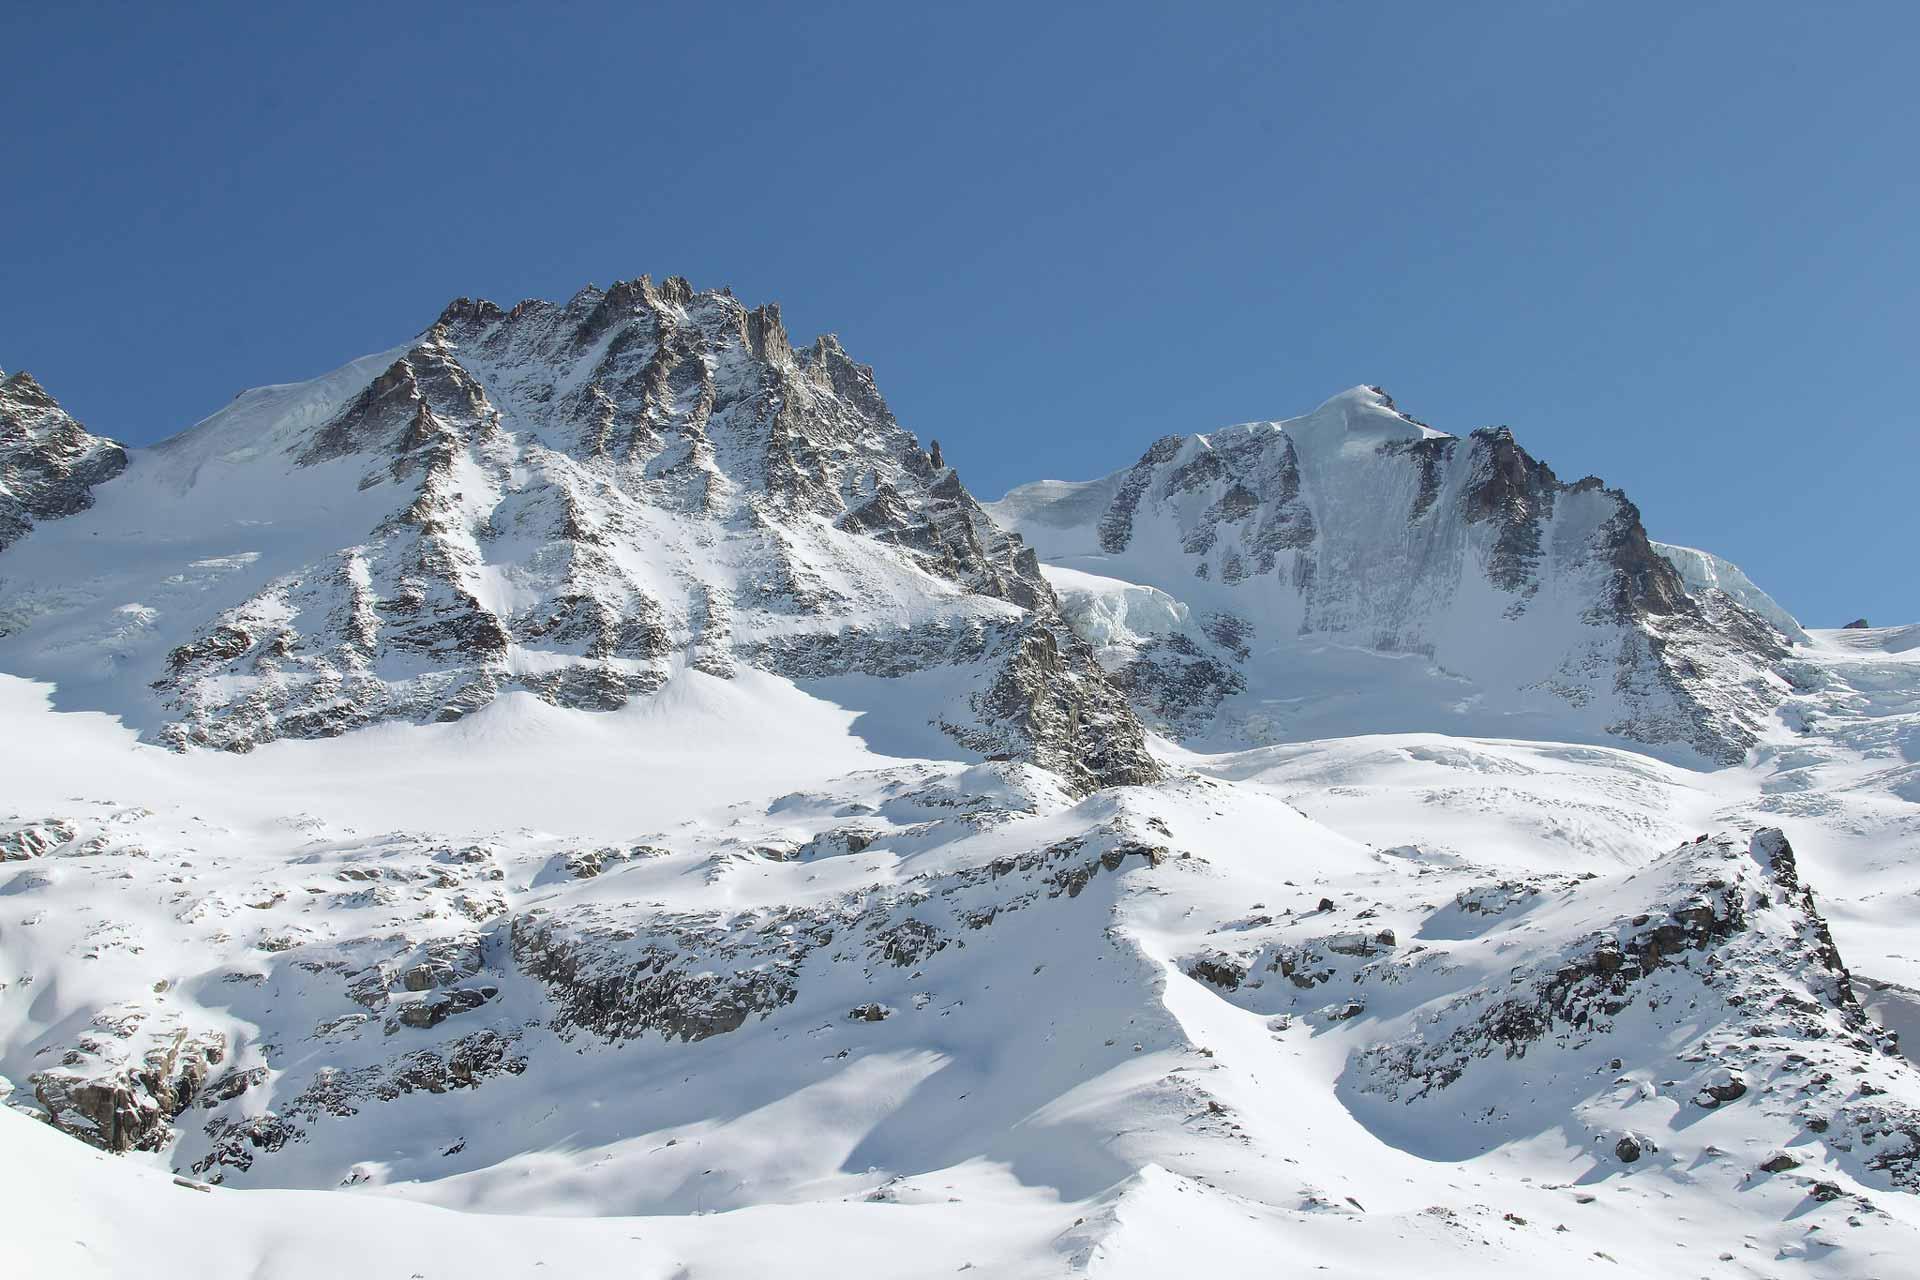 Sci alpinismo in Valle d'Aosta